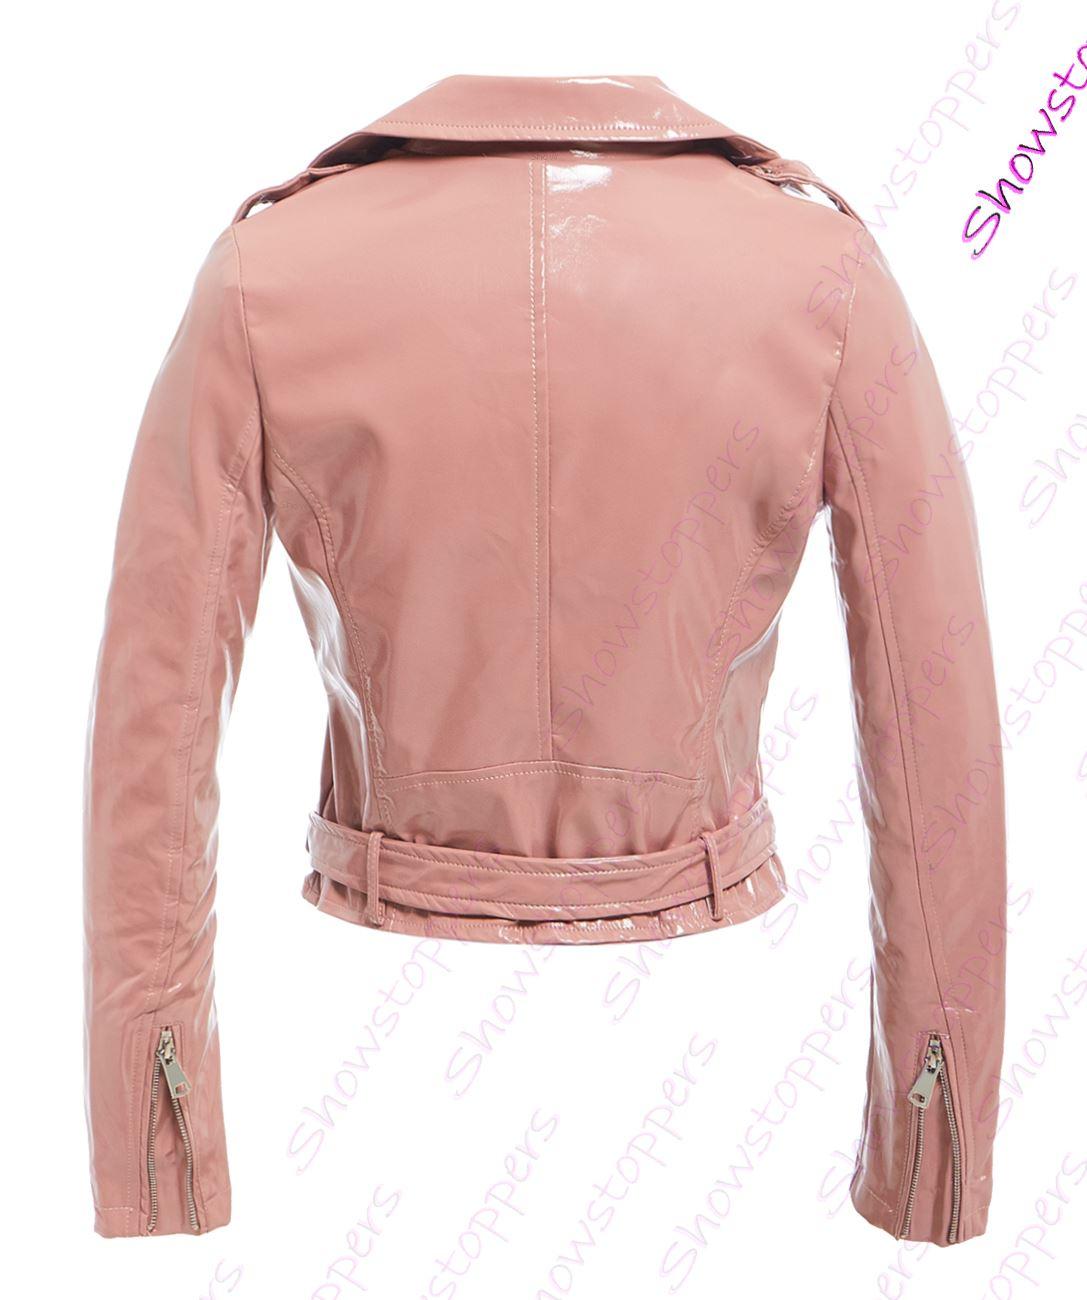 Womens-Patent-Biker-Jacket-Ladies-Size-8-10-12-14-16-PU-Black-Pink-New thumbnail 8